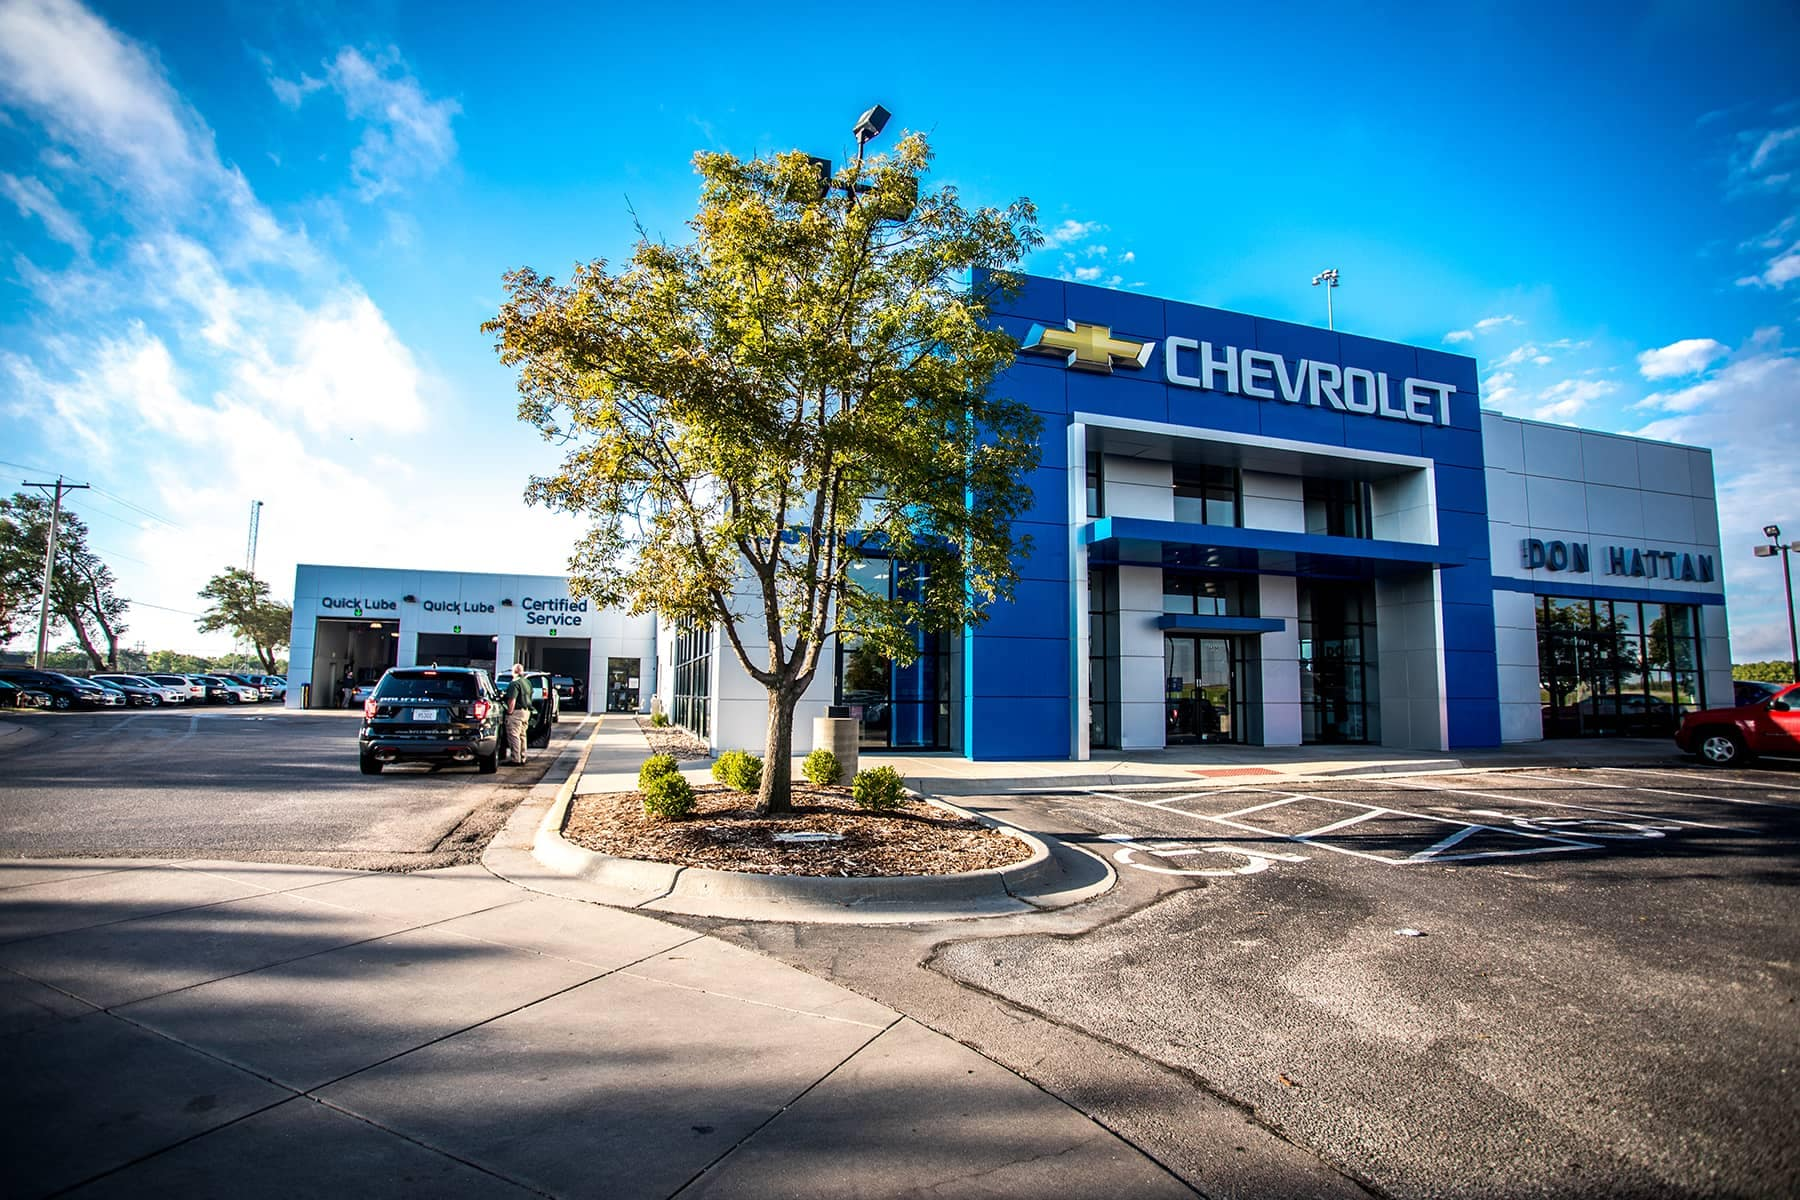 Chevrolet service image